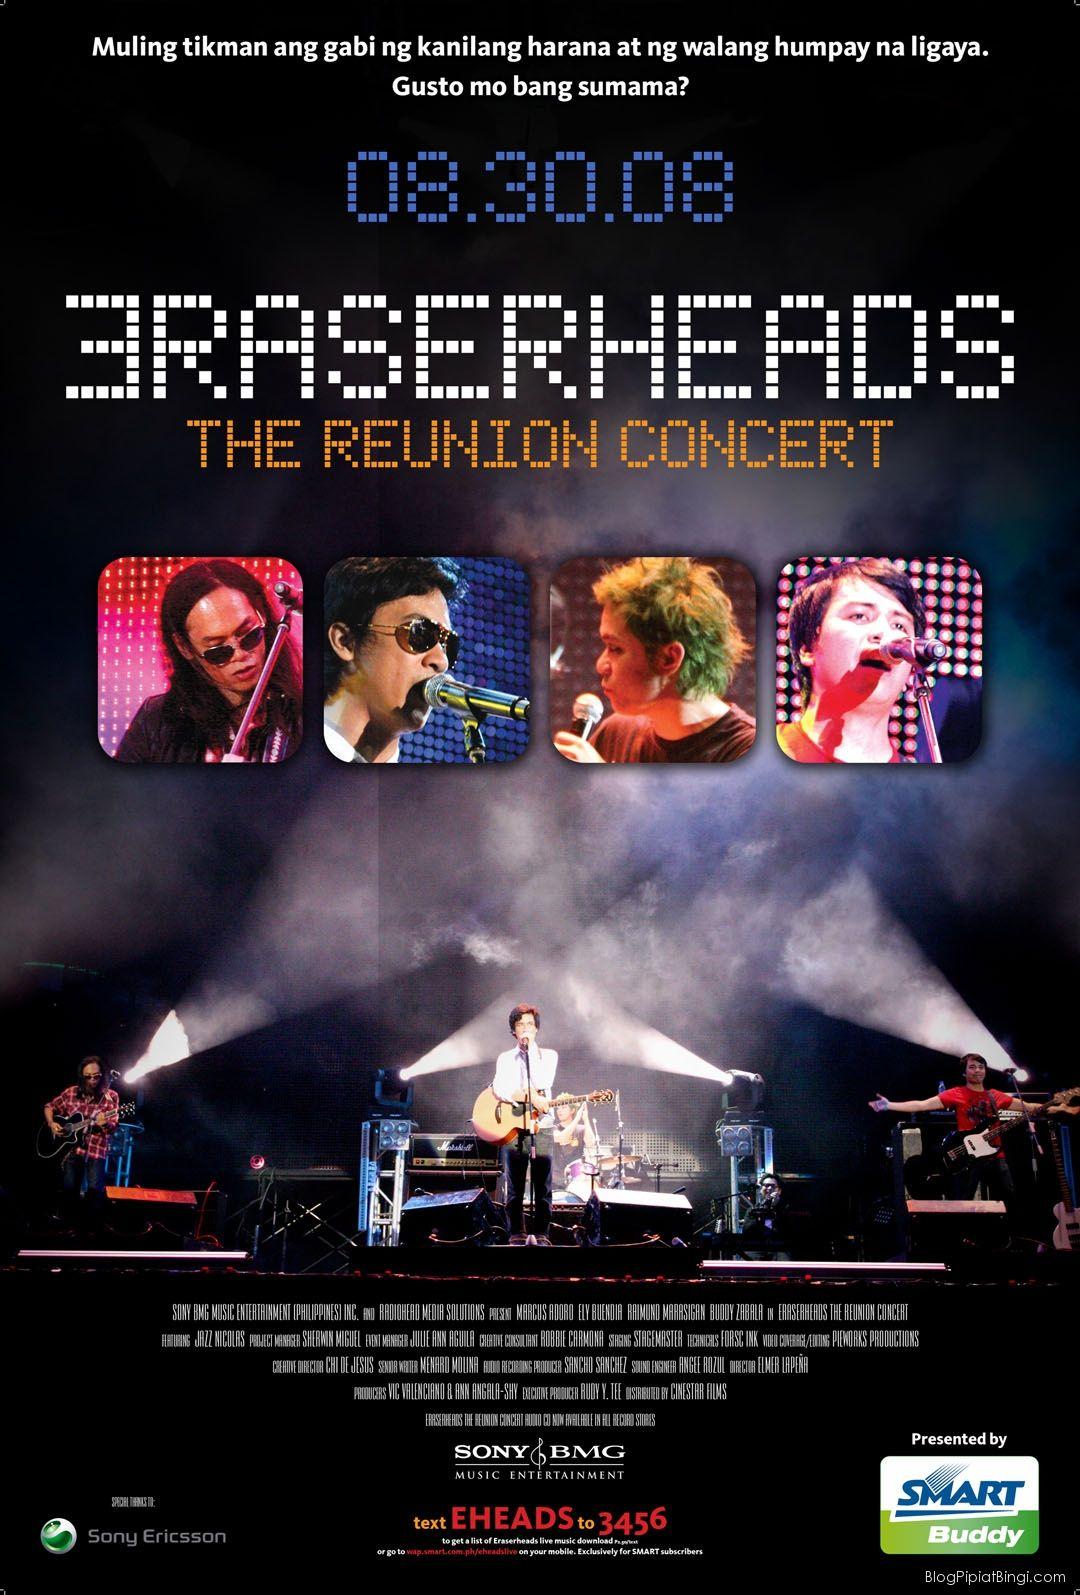 Eraserheads Manila 2008 The Reunion Documentary Movies Bmg Music